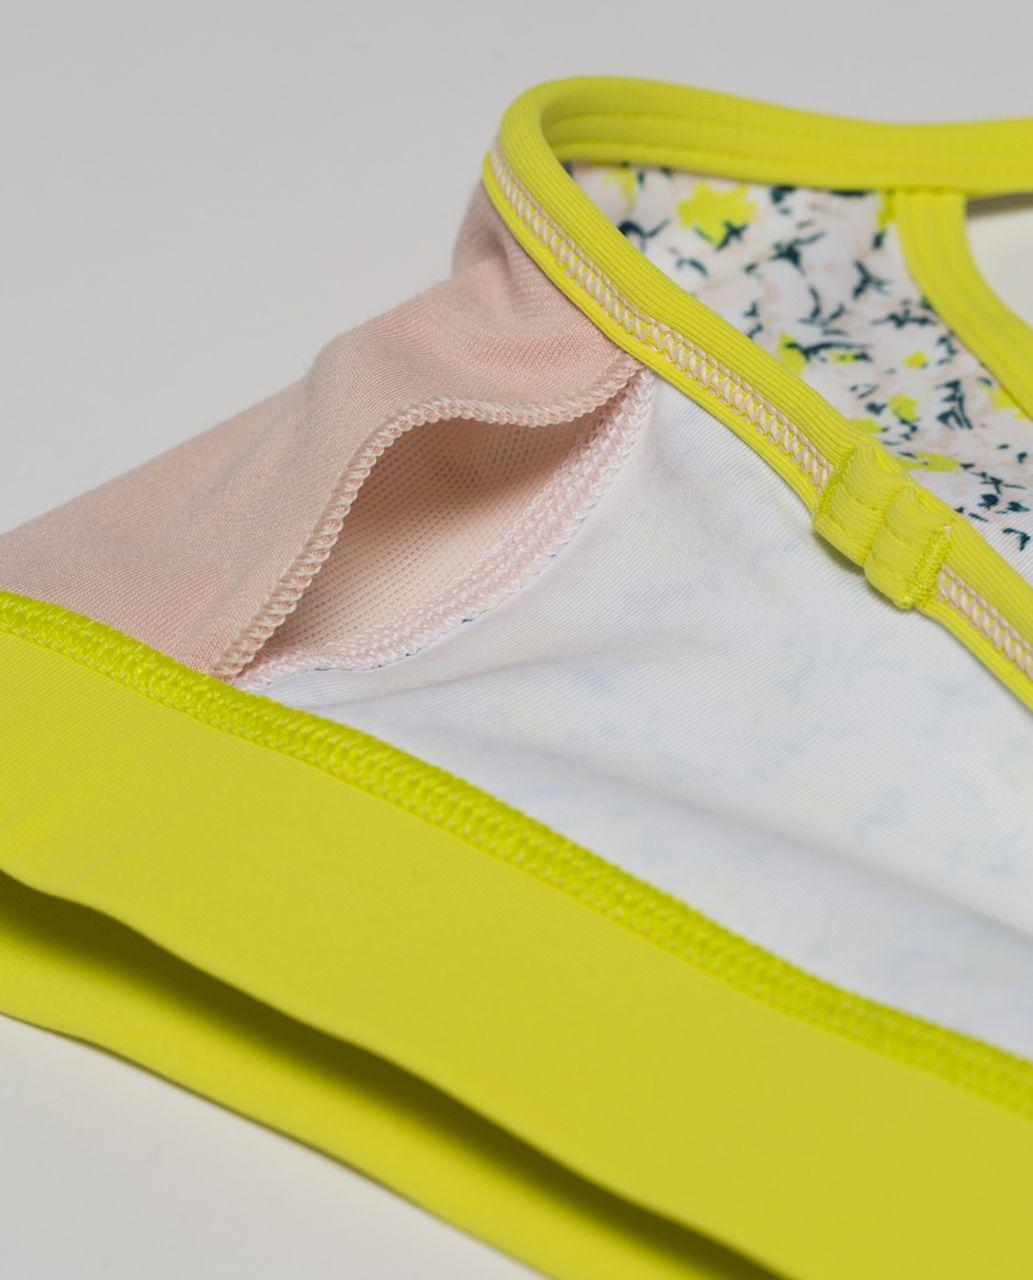 Lululemon Flow Y Bra IV - Fresh Fleur Neutral Blush Split Pea / Split Pea